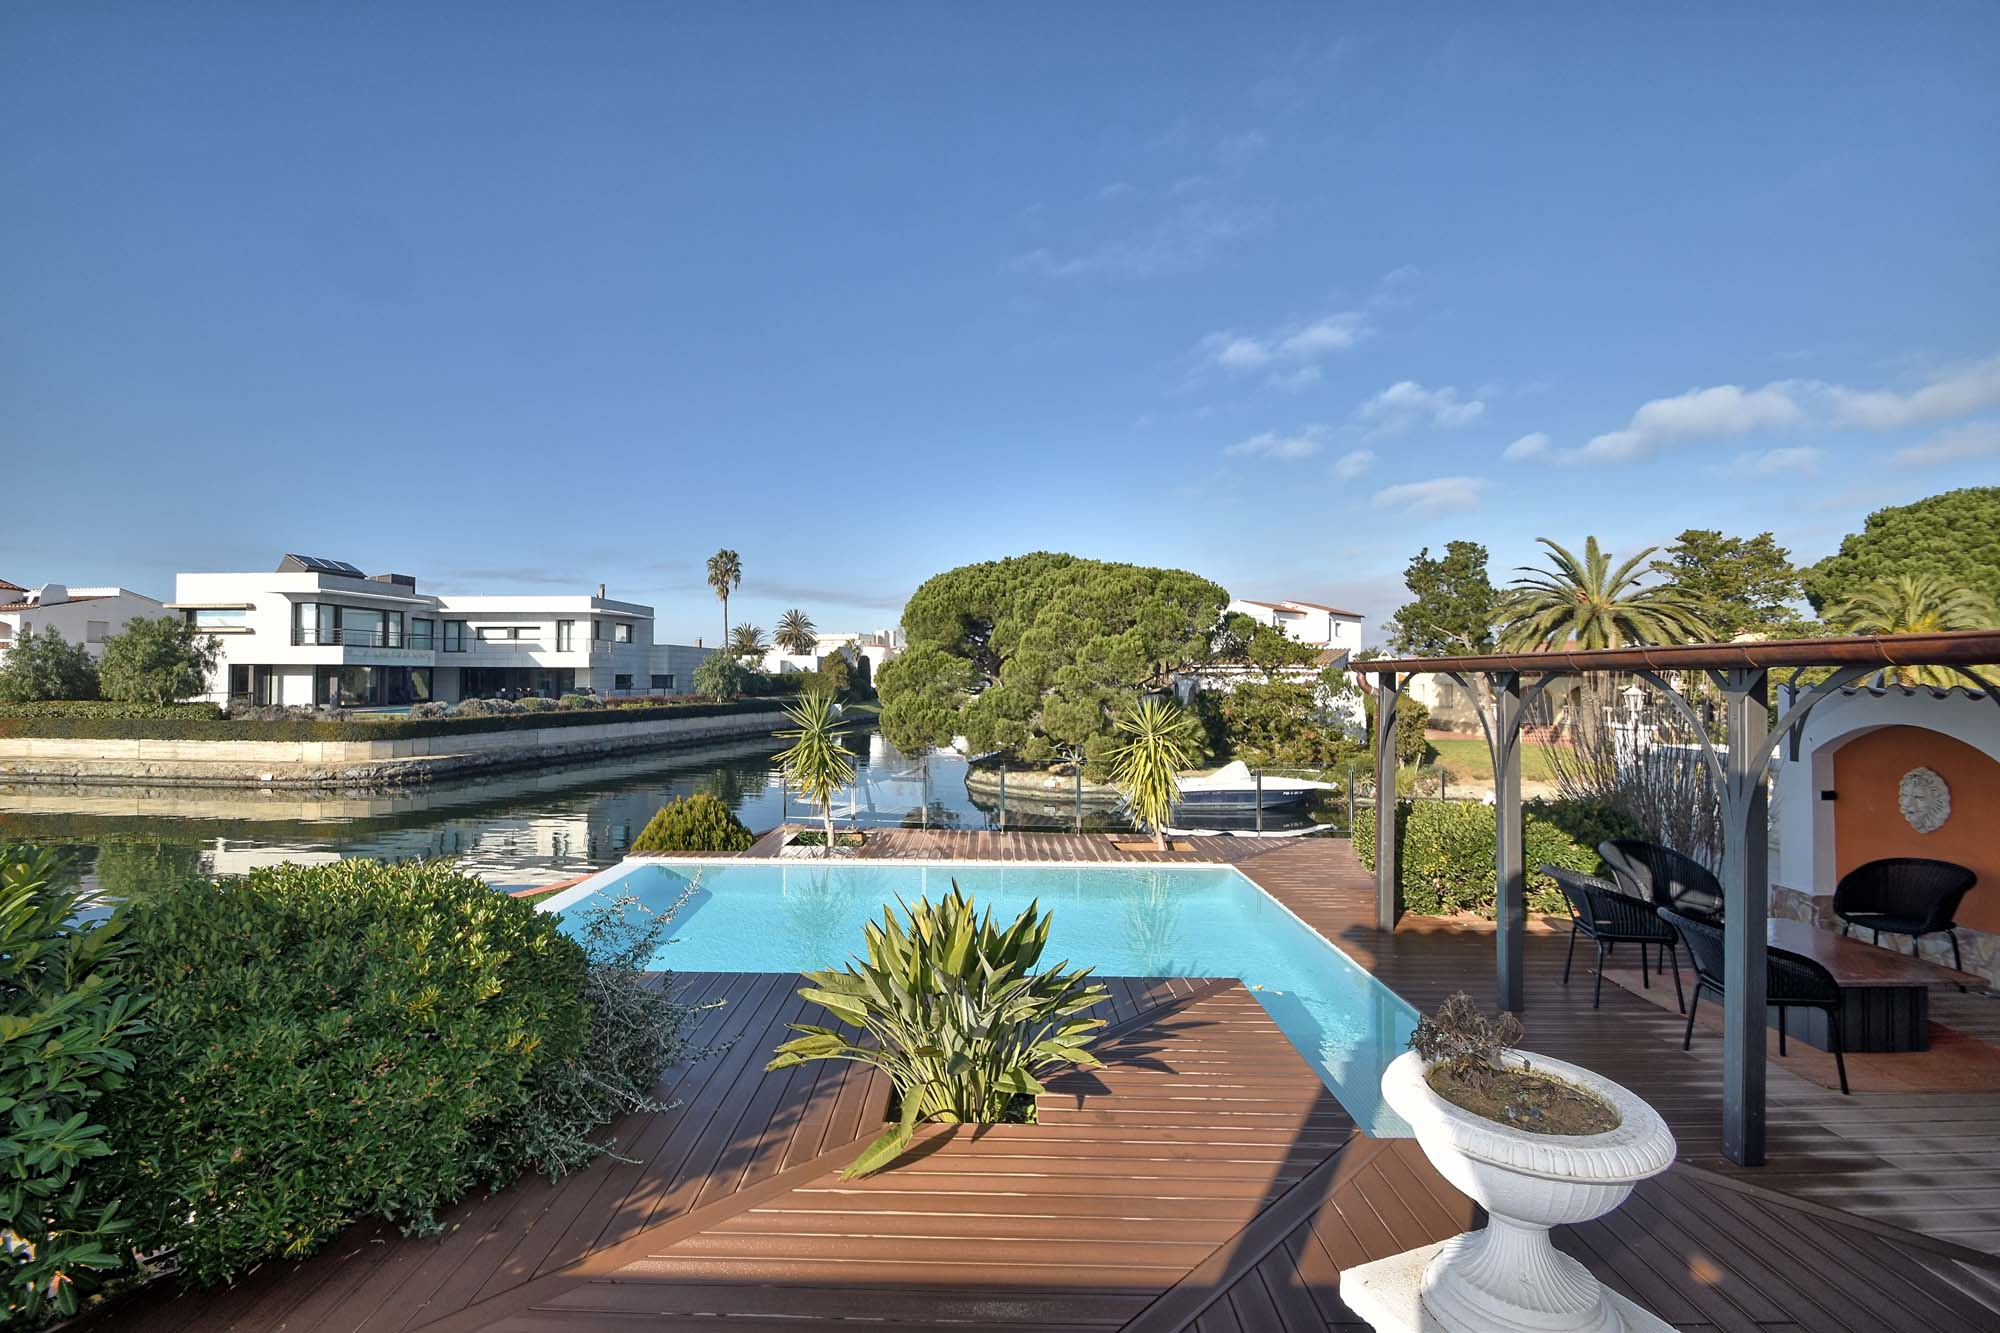 Location maison avec piscine empuriabrava espagne - Maison location espagne avec piscine ...